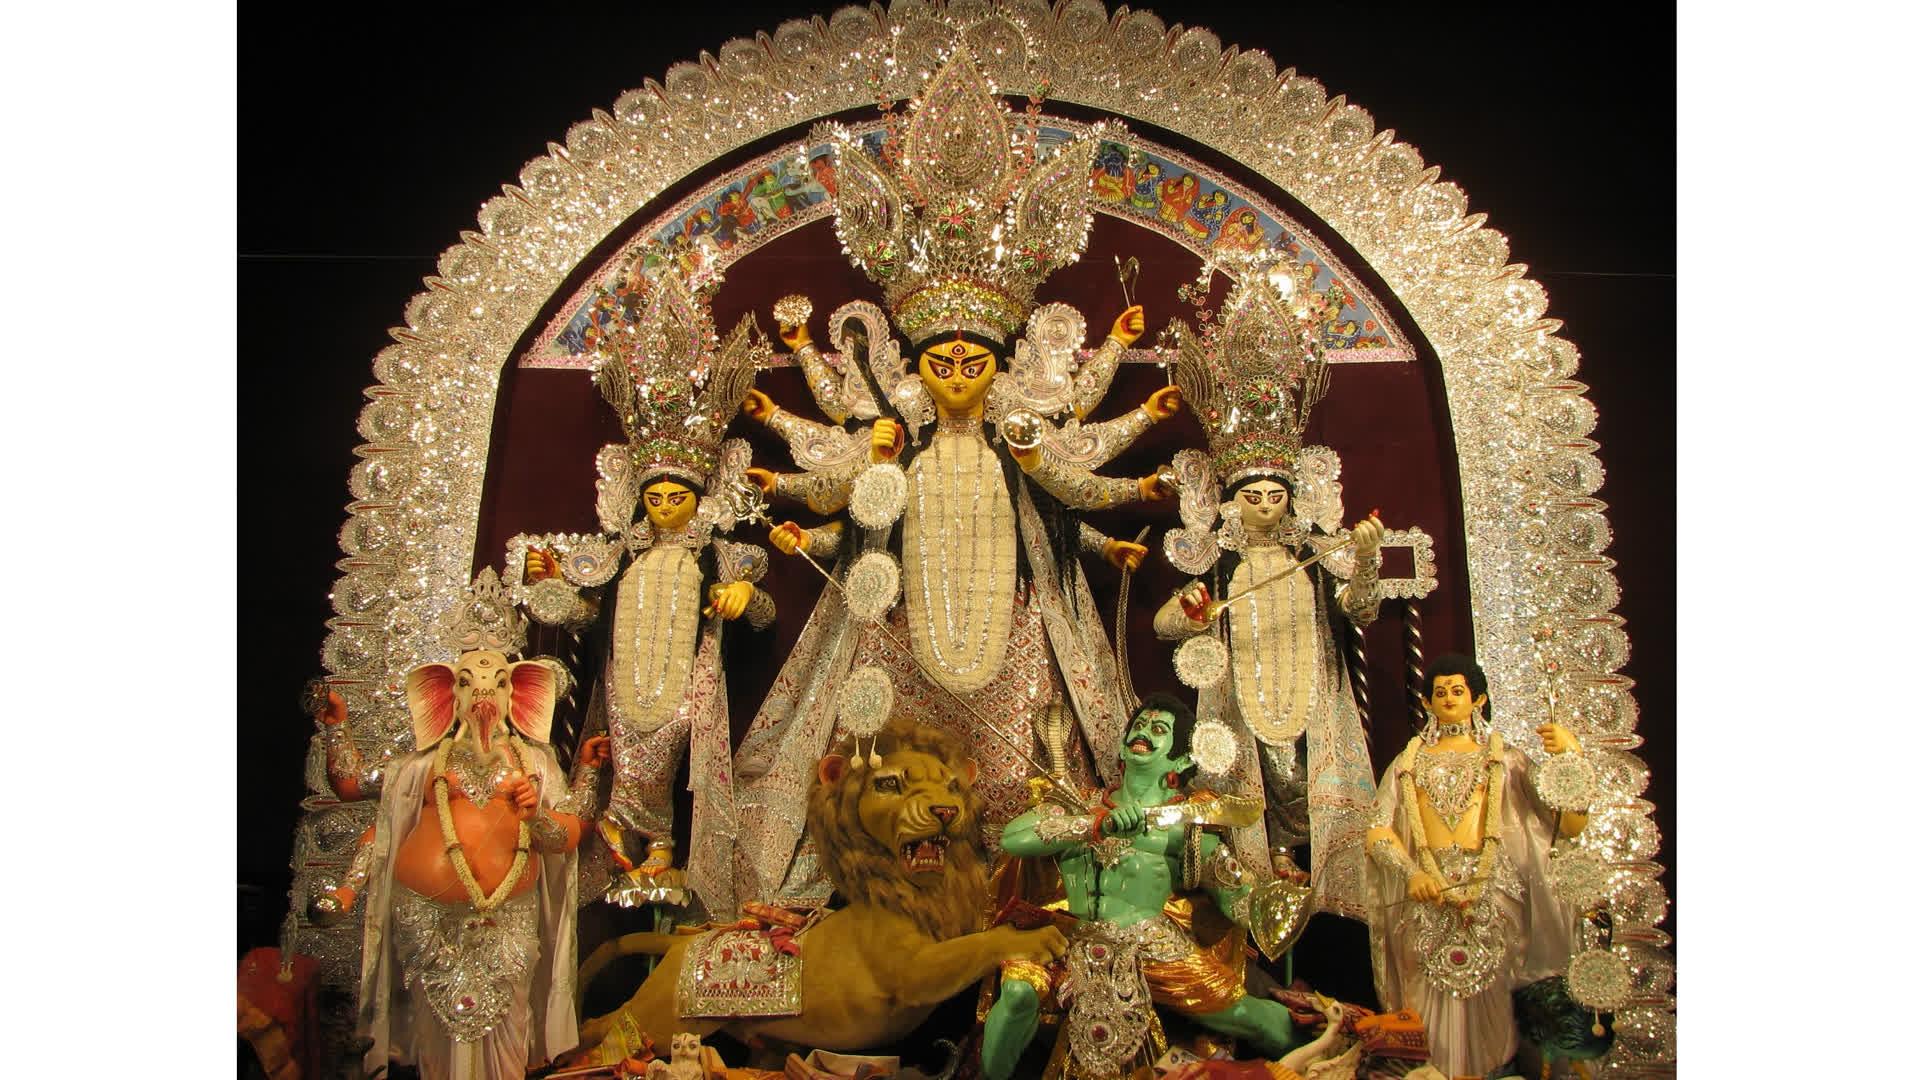 Guptipara: Birthplace of the People's Durga Puja